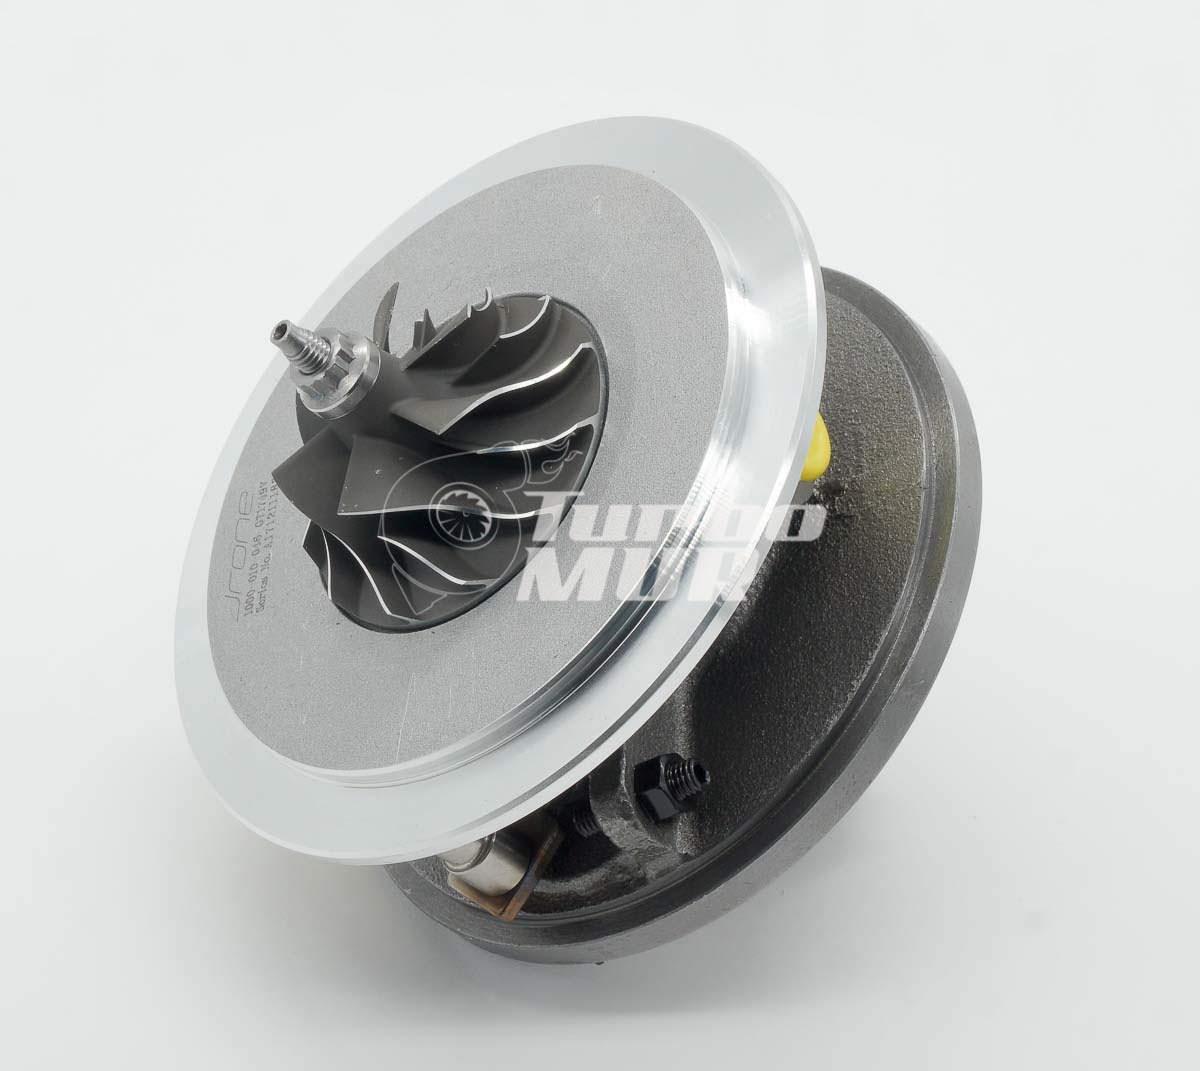 Turbomur - Cartucho Garrett Renault 1.9DCI 120CV